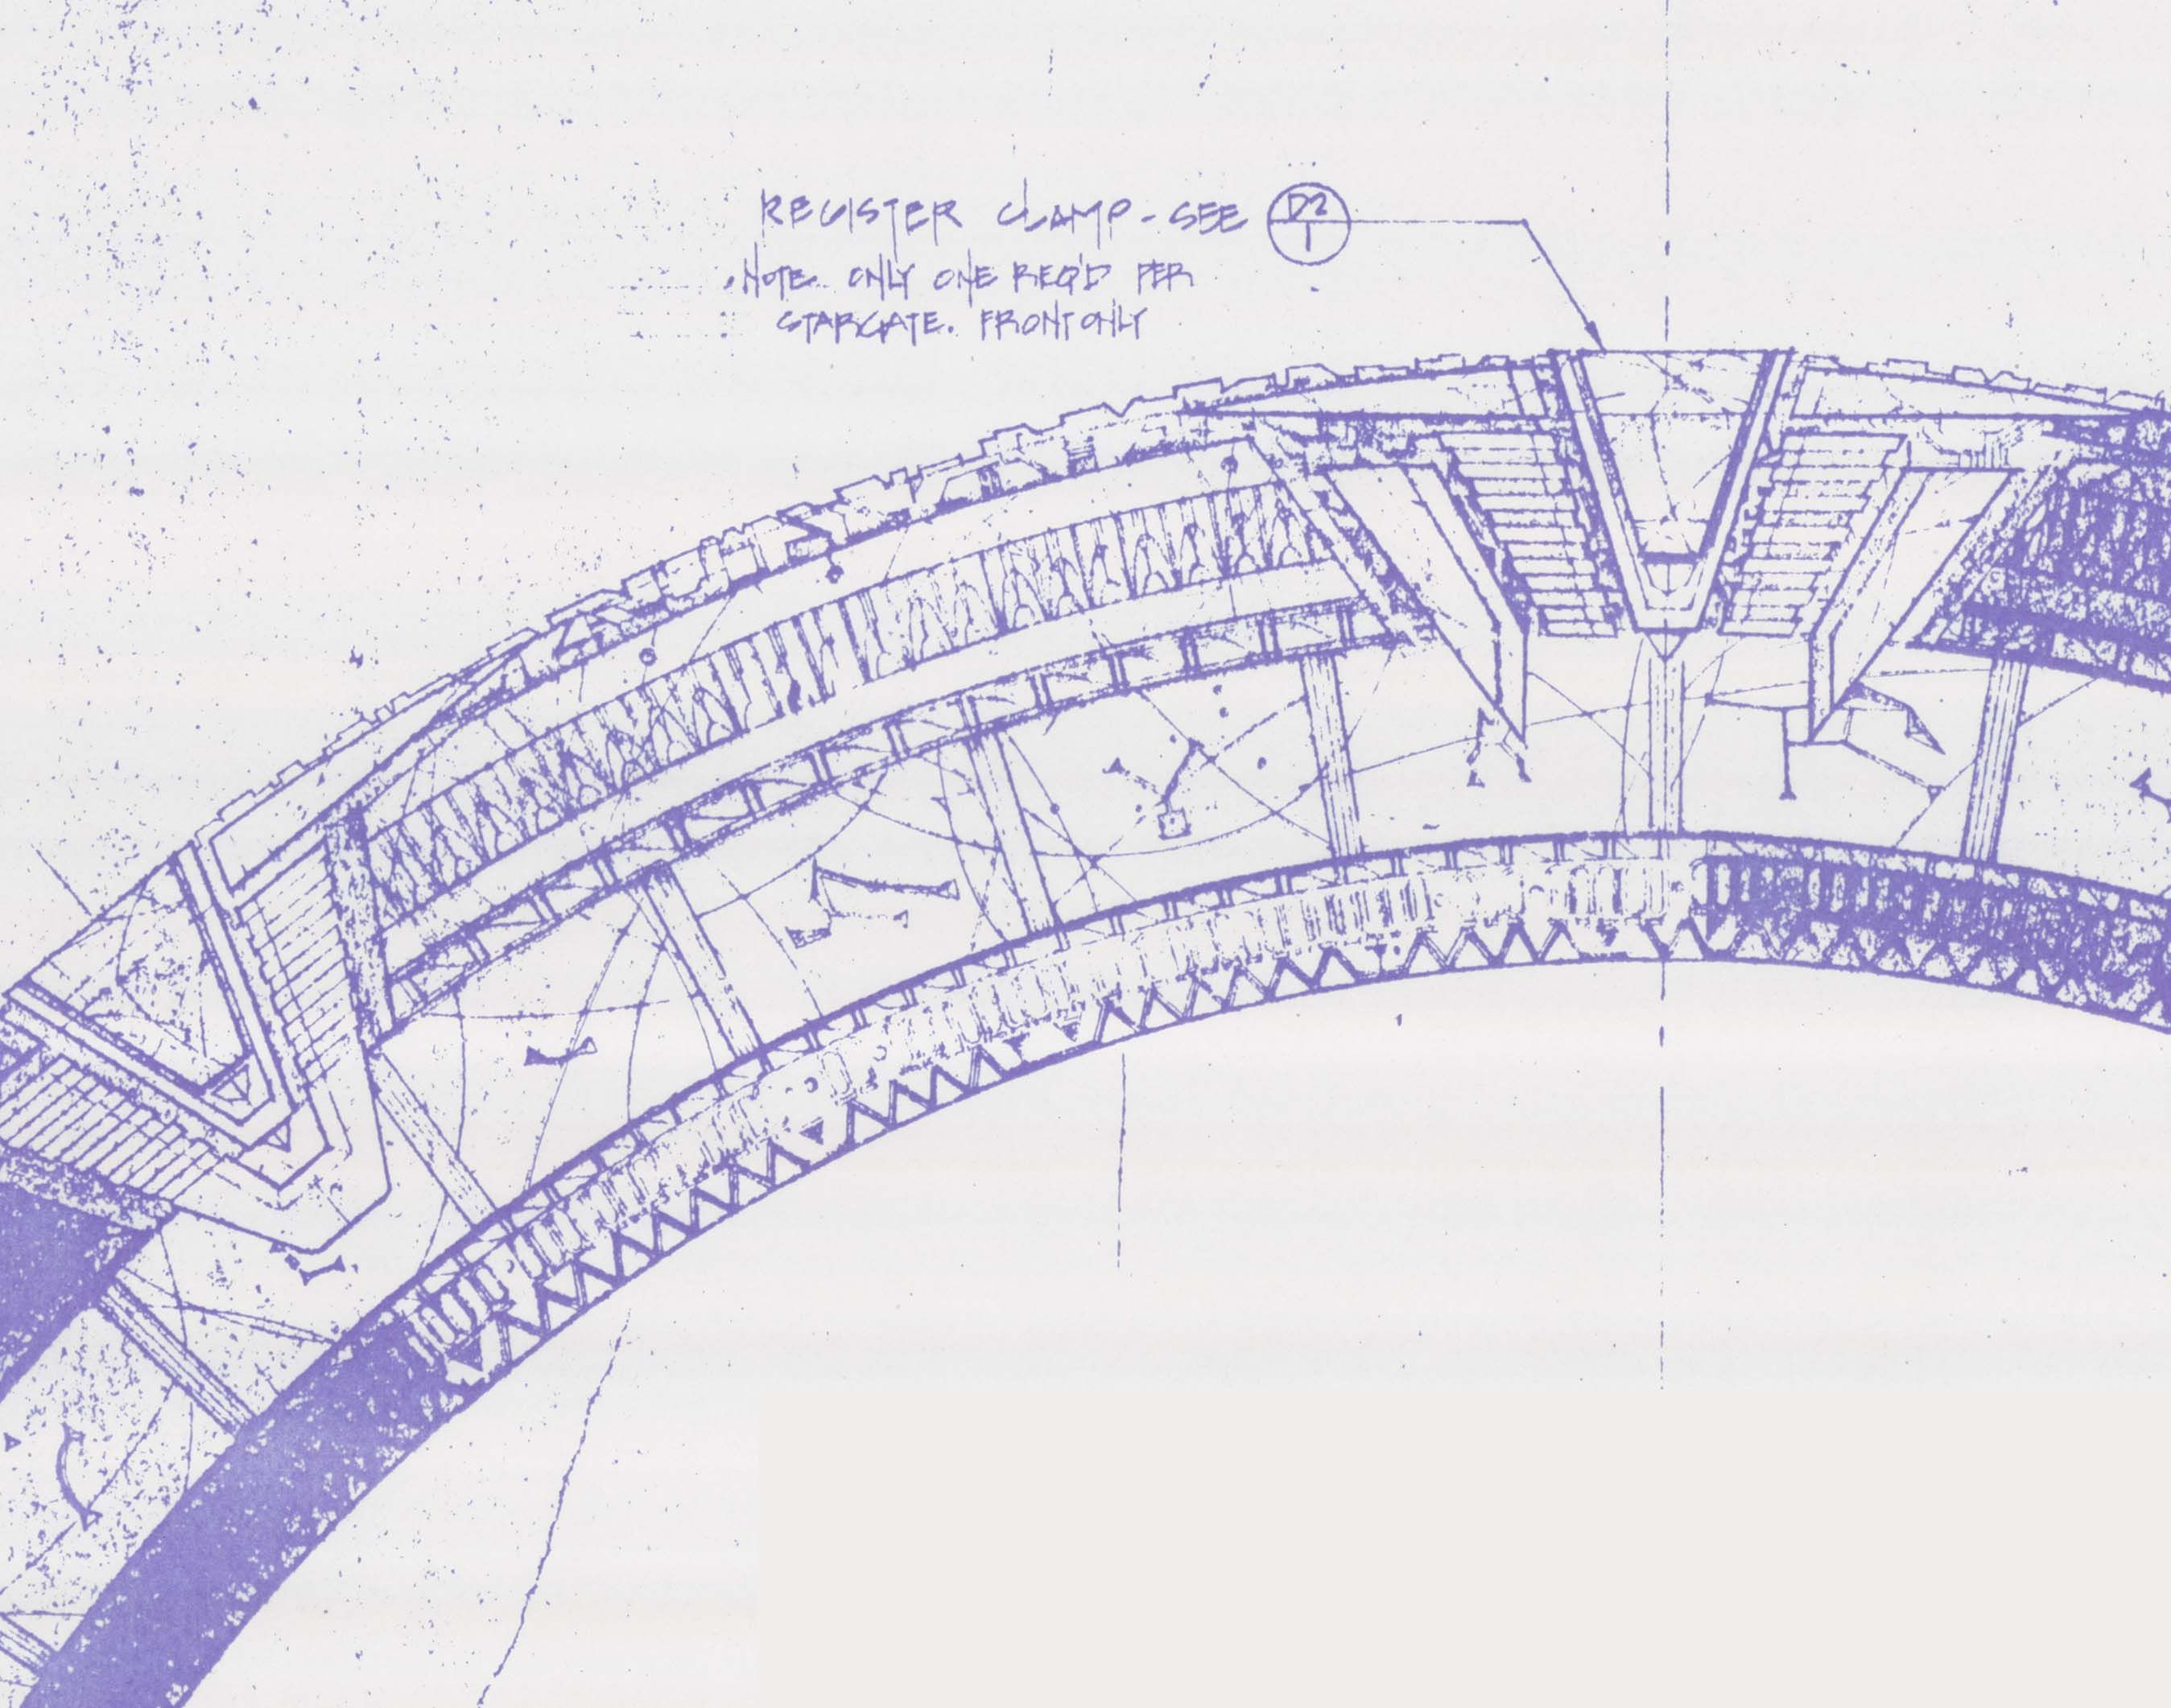 Stargate blueprints sci fi stargate pinterest stargate sci httptherpfattachmentsf9stargate malvernweather Choice Image